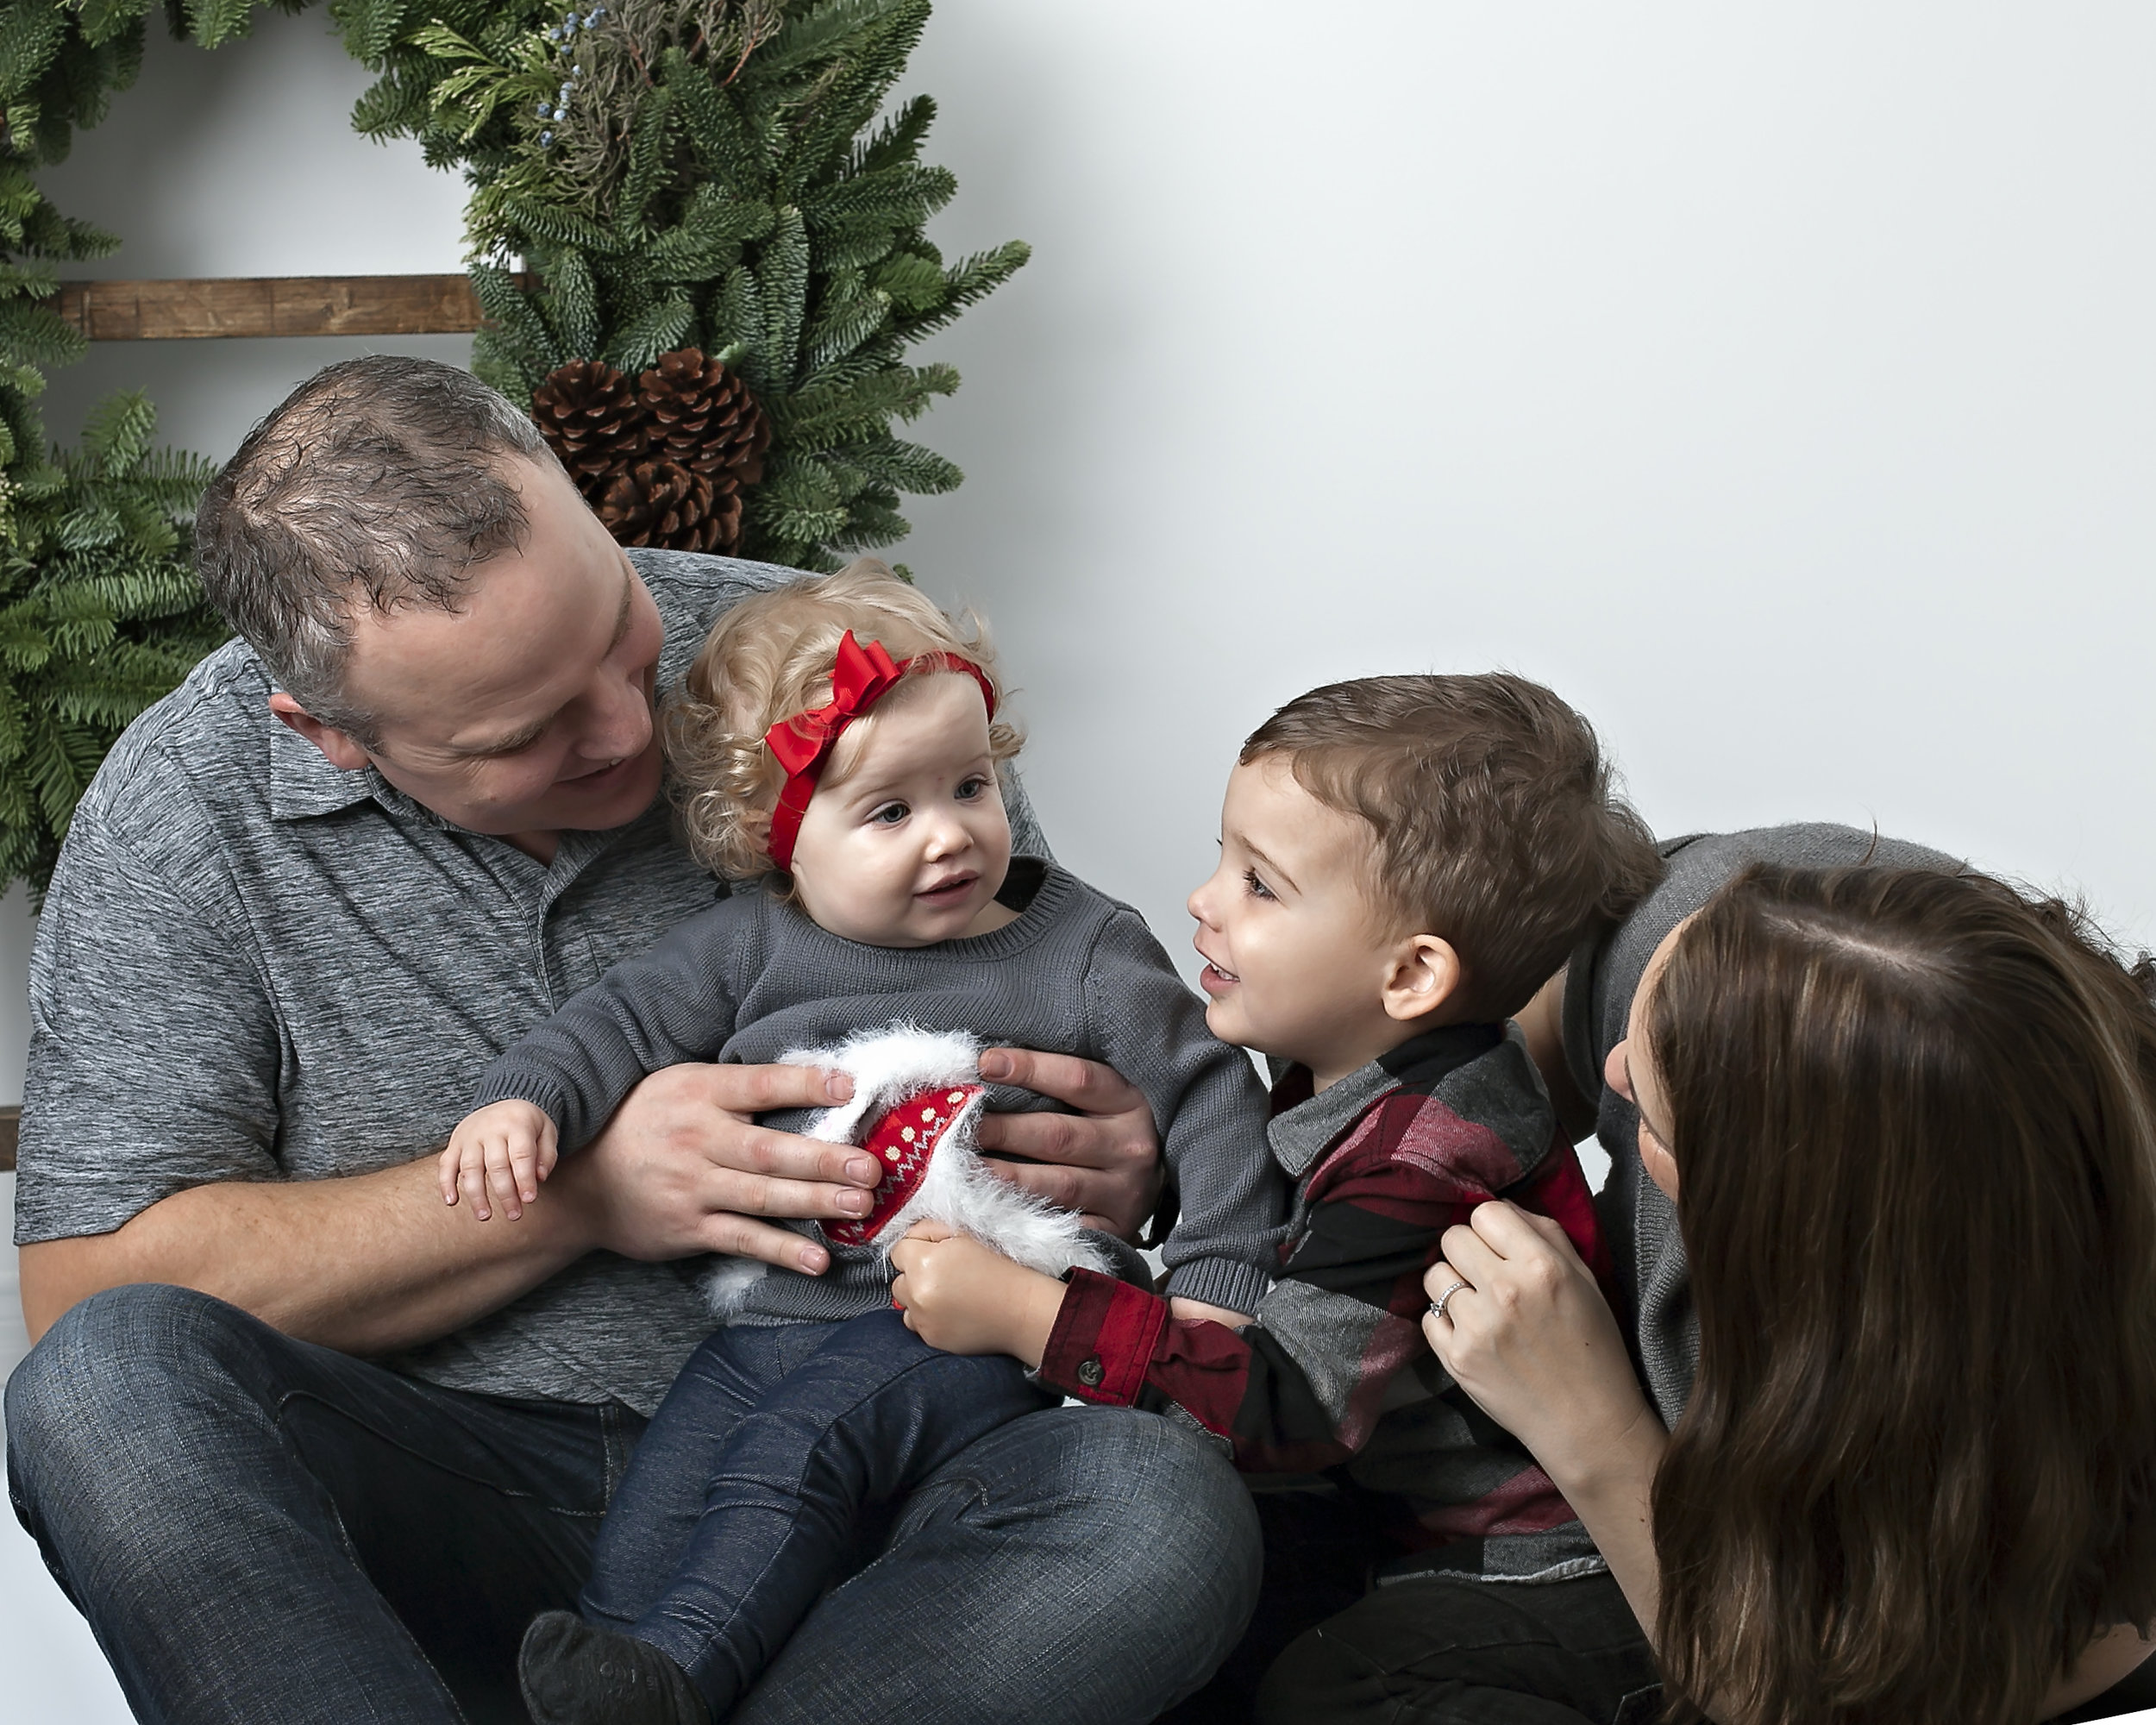 Ajax_Christmas_Portrait_Photographer_Petra_King_Photography